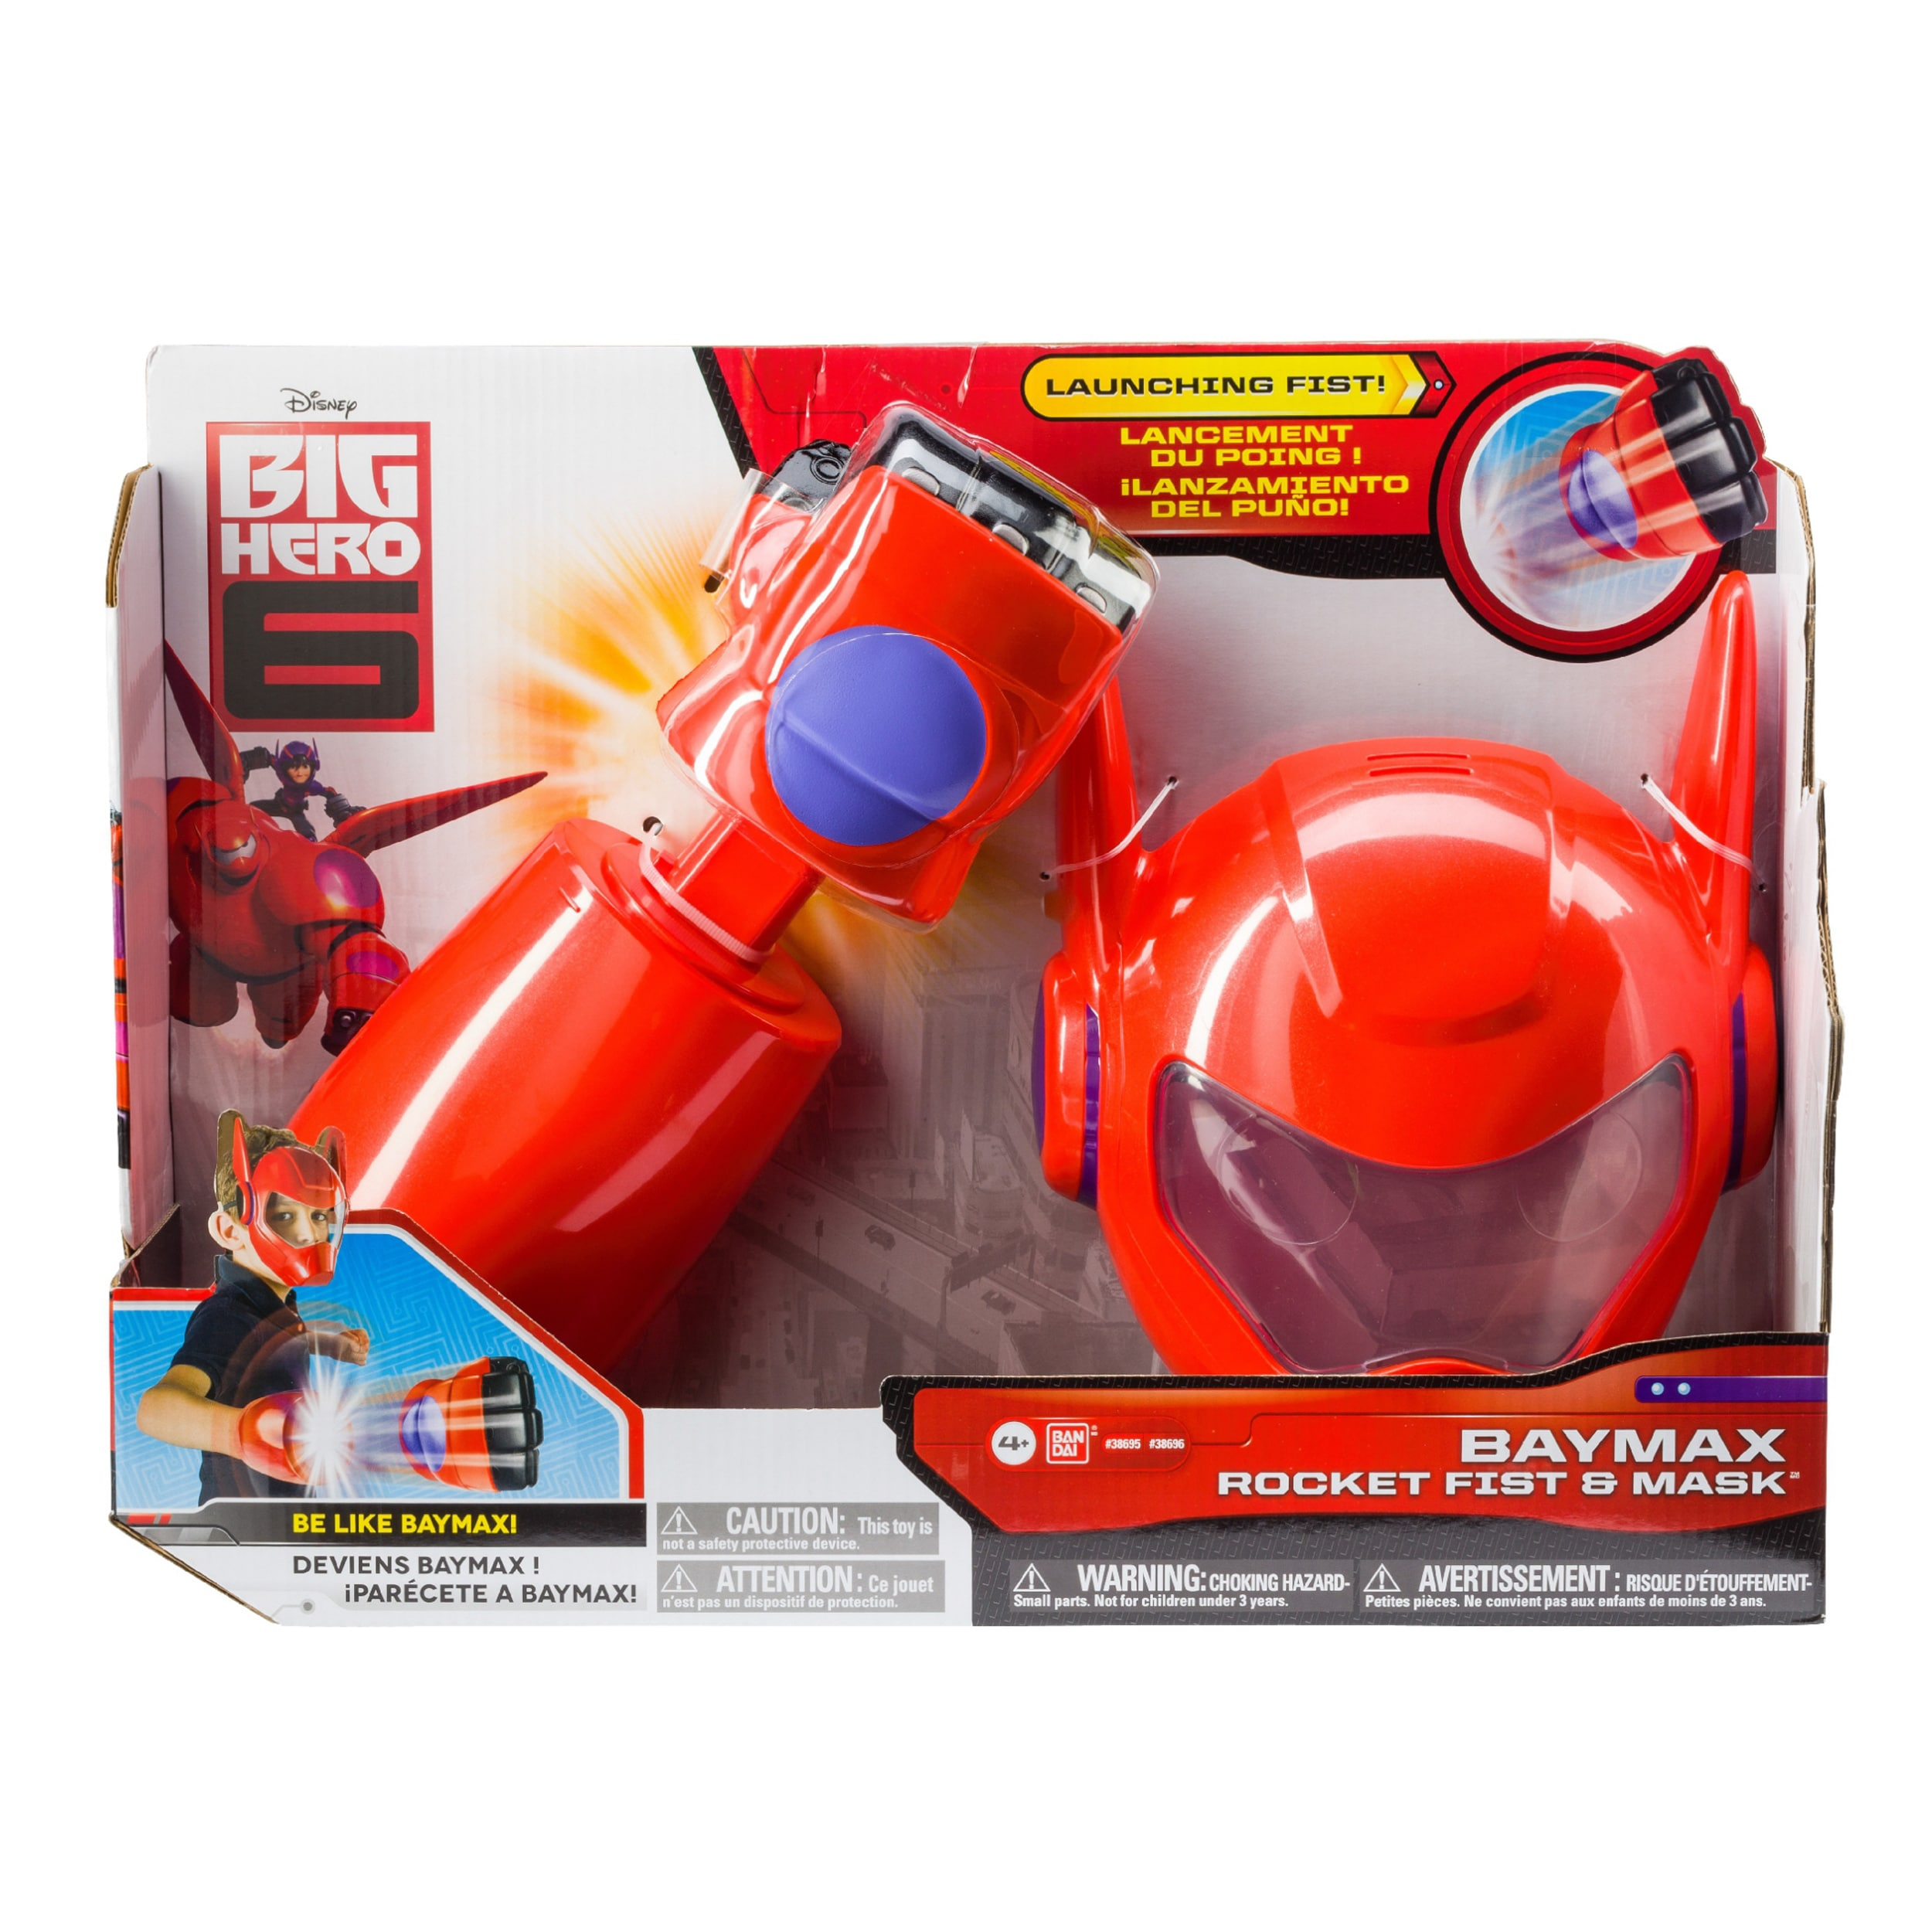 Big Hero 6 Exclusive Baymax Rocket Fist